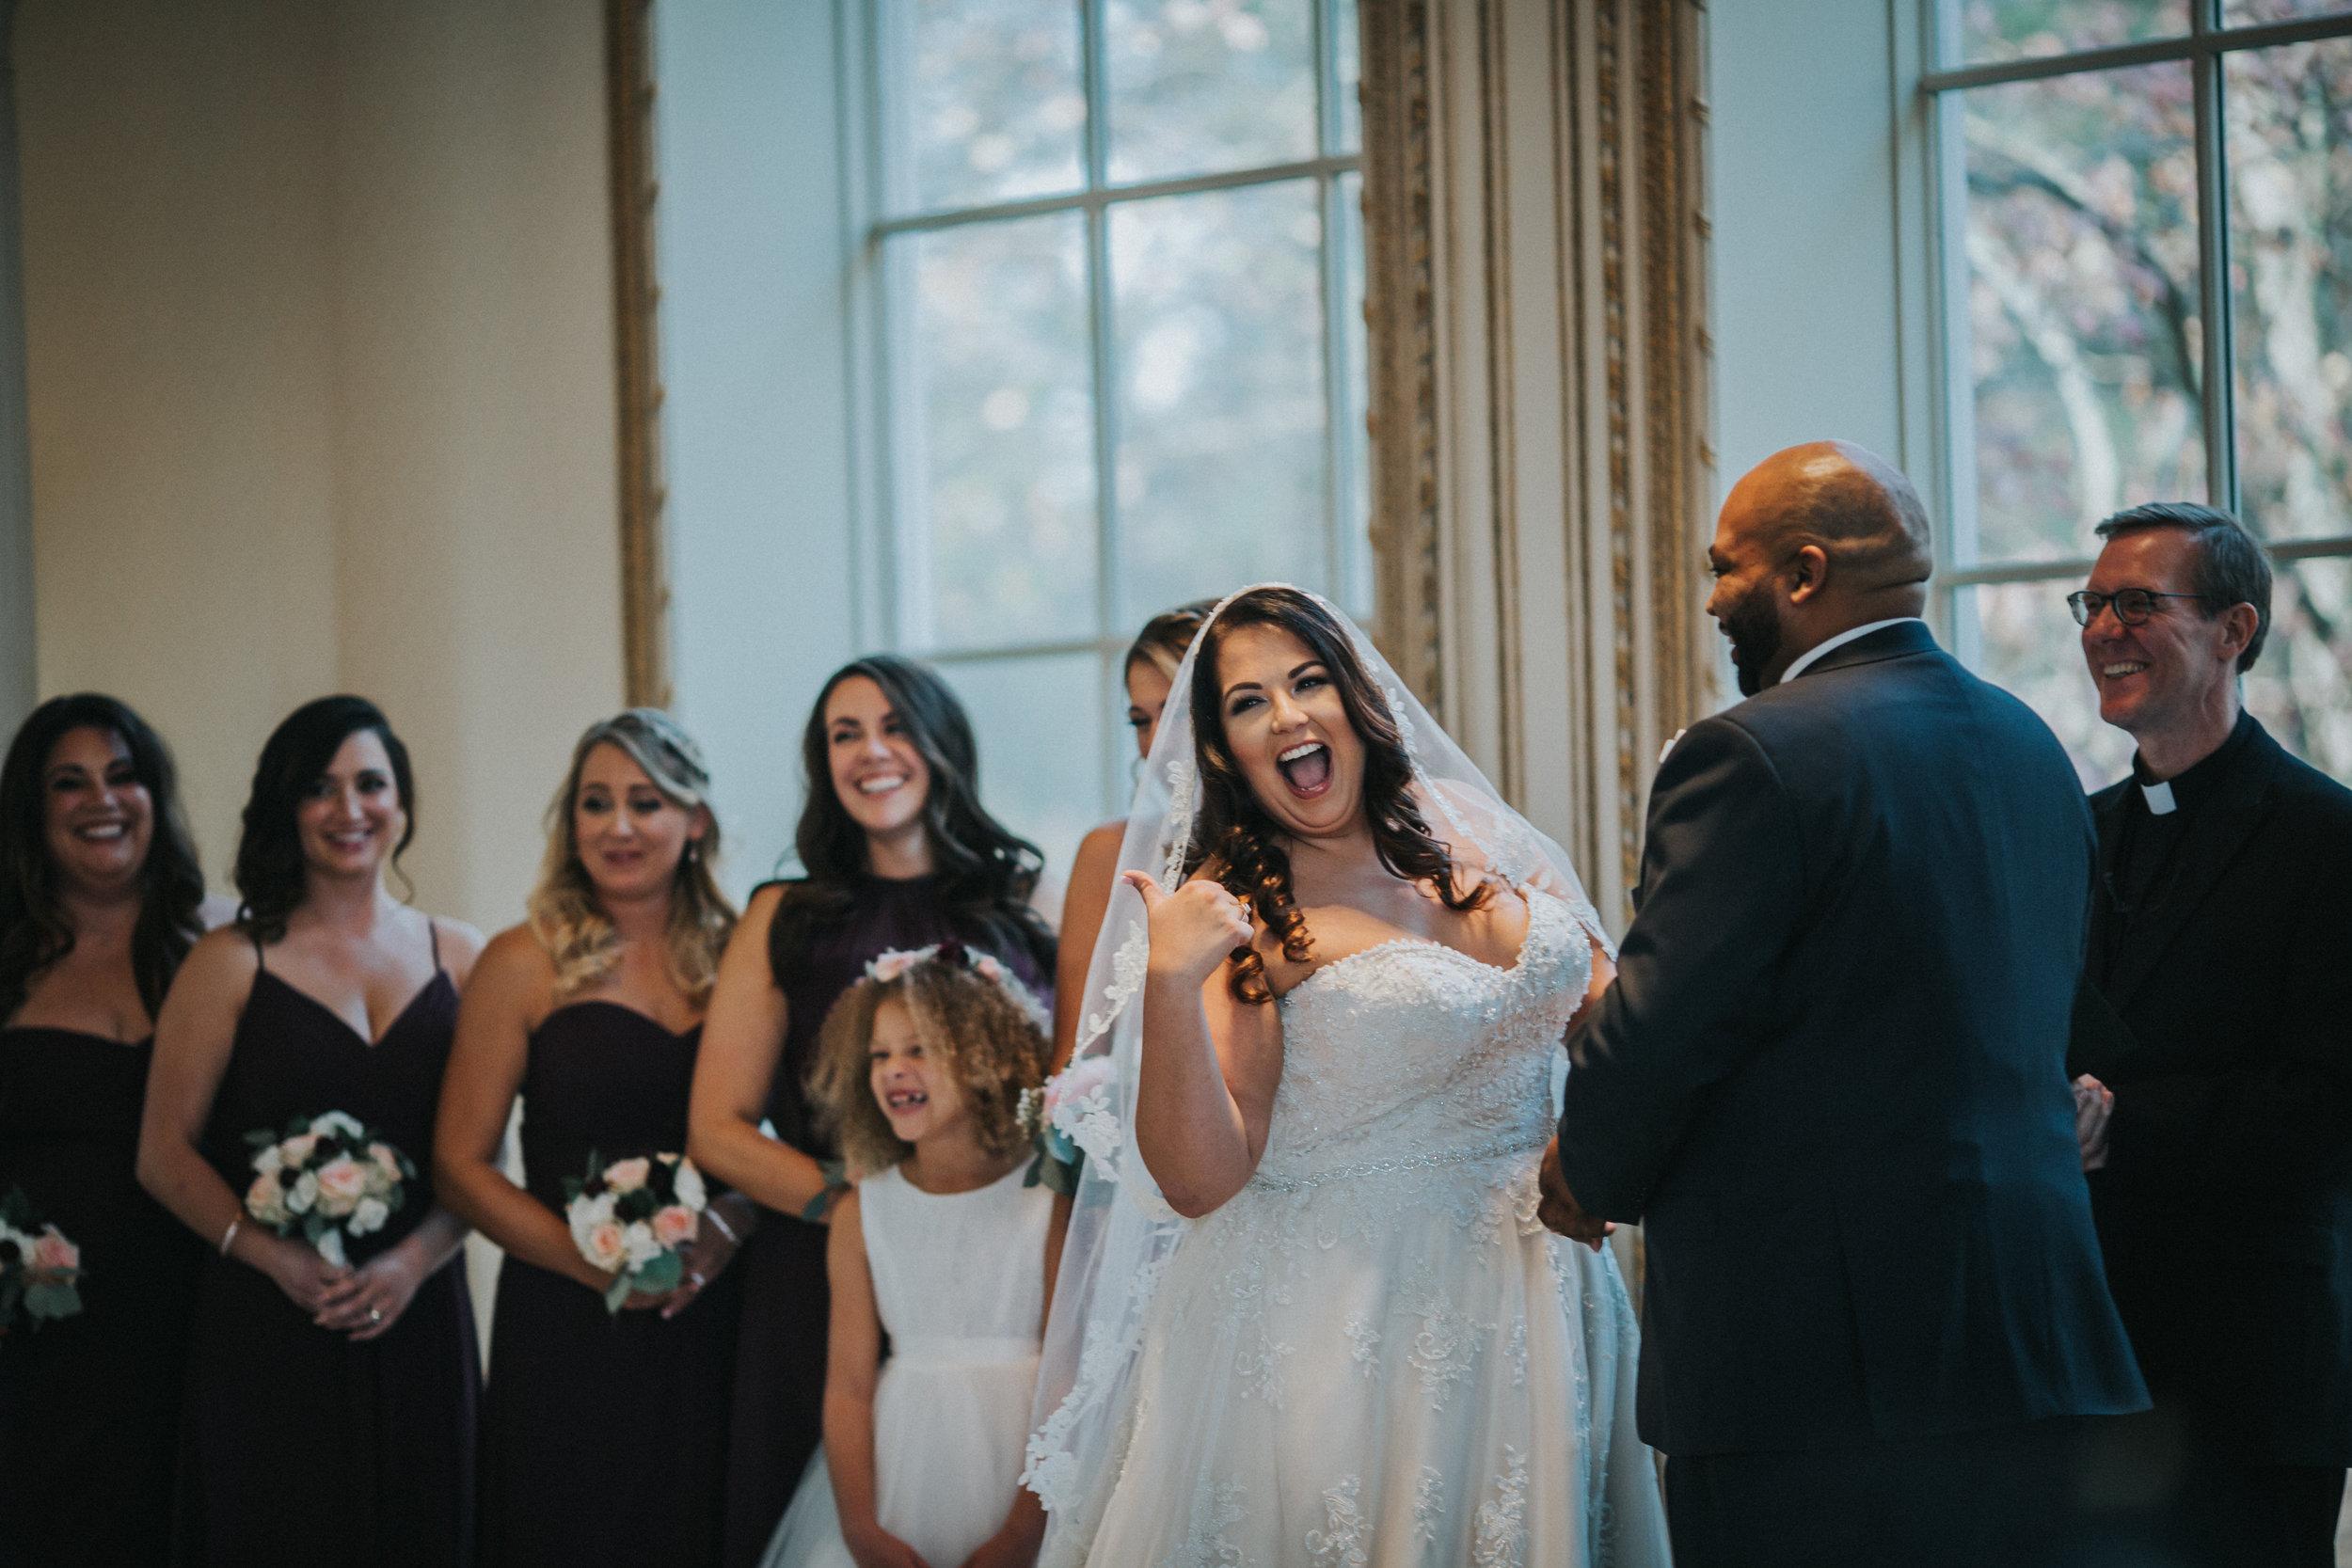 New-Jersey-Wedding-Photography-Brigalias-Deanna&Darryl-Ceremony-42.jpg